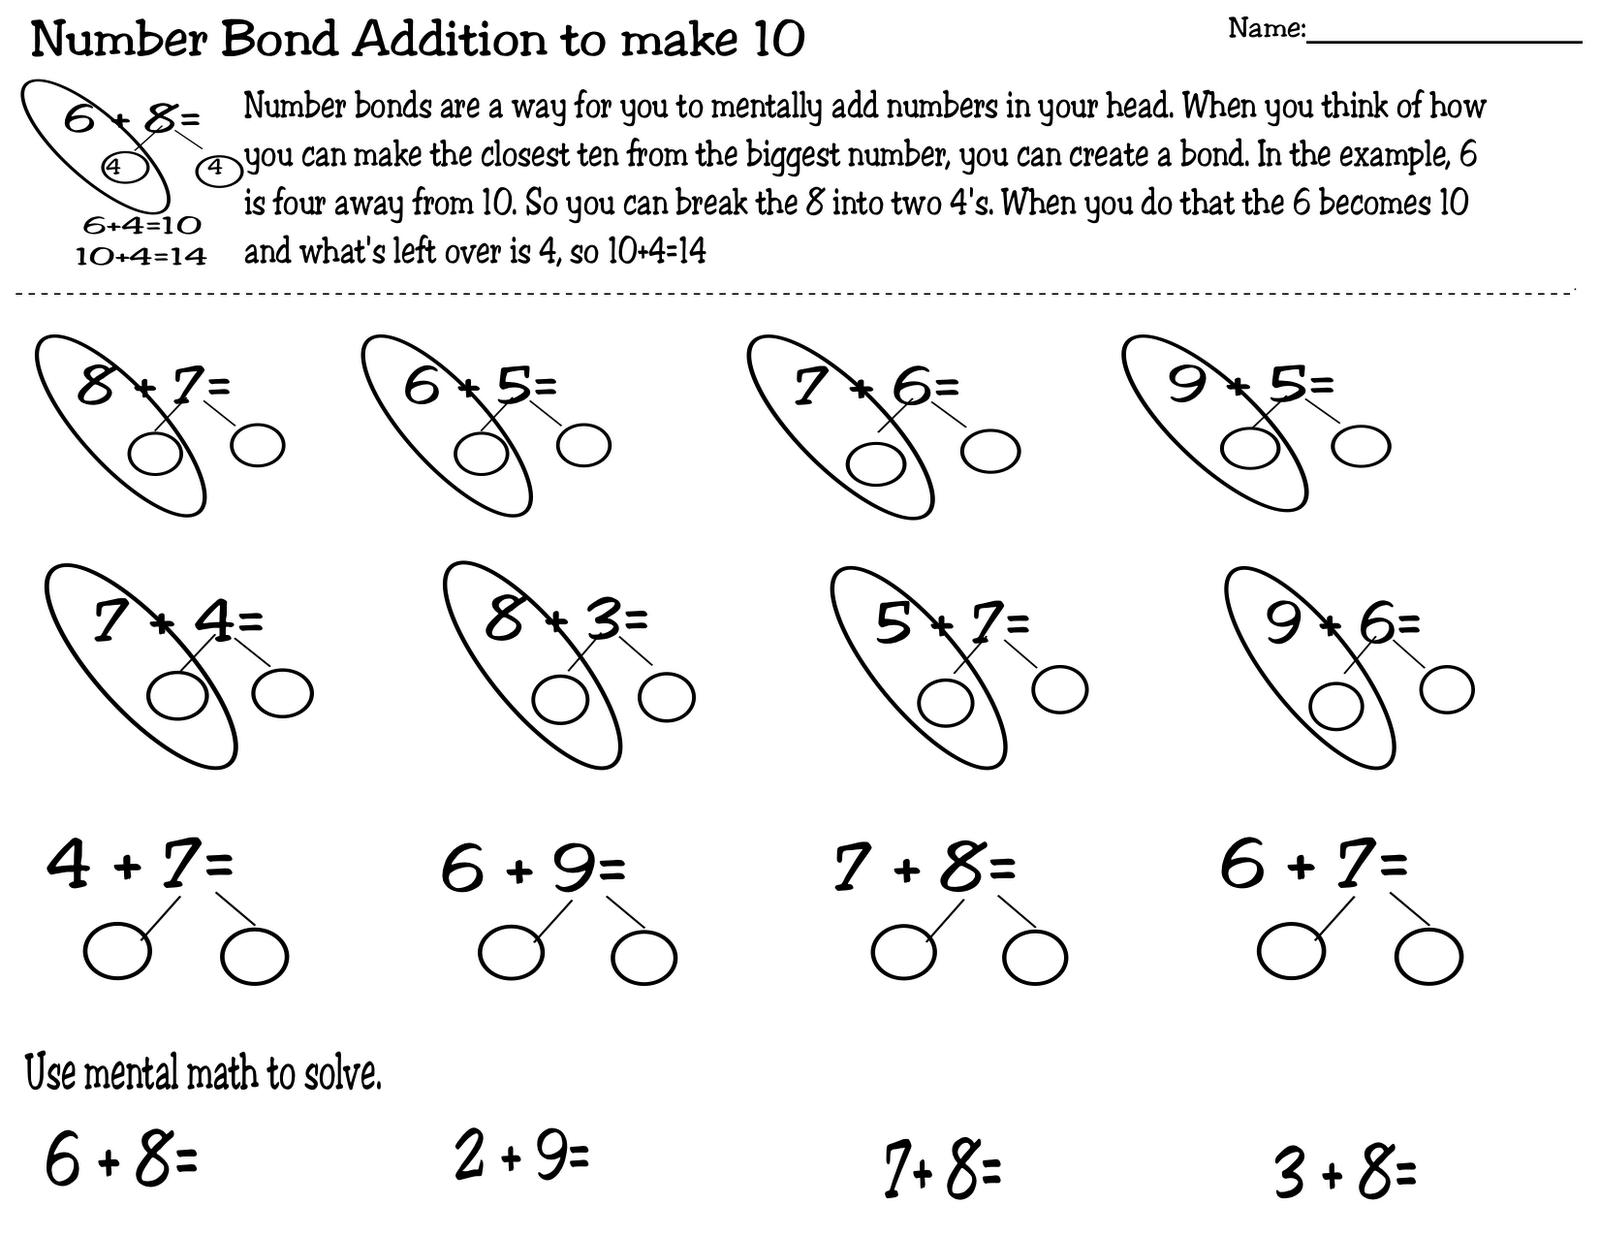 worksheet Number Bond Worksheets 1st Grade number bonds worksheets for first grade free library te ch g mrs t september 2012